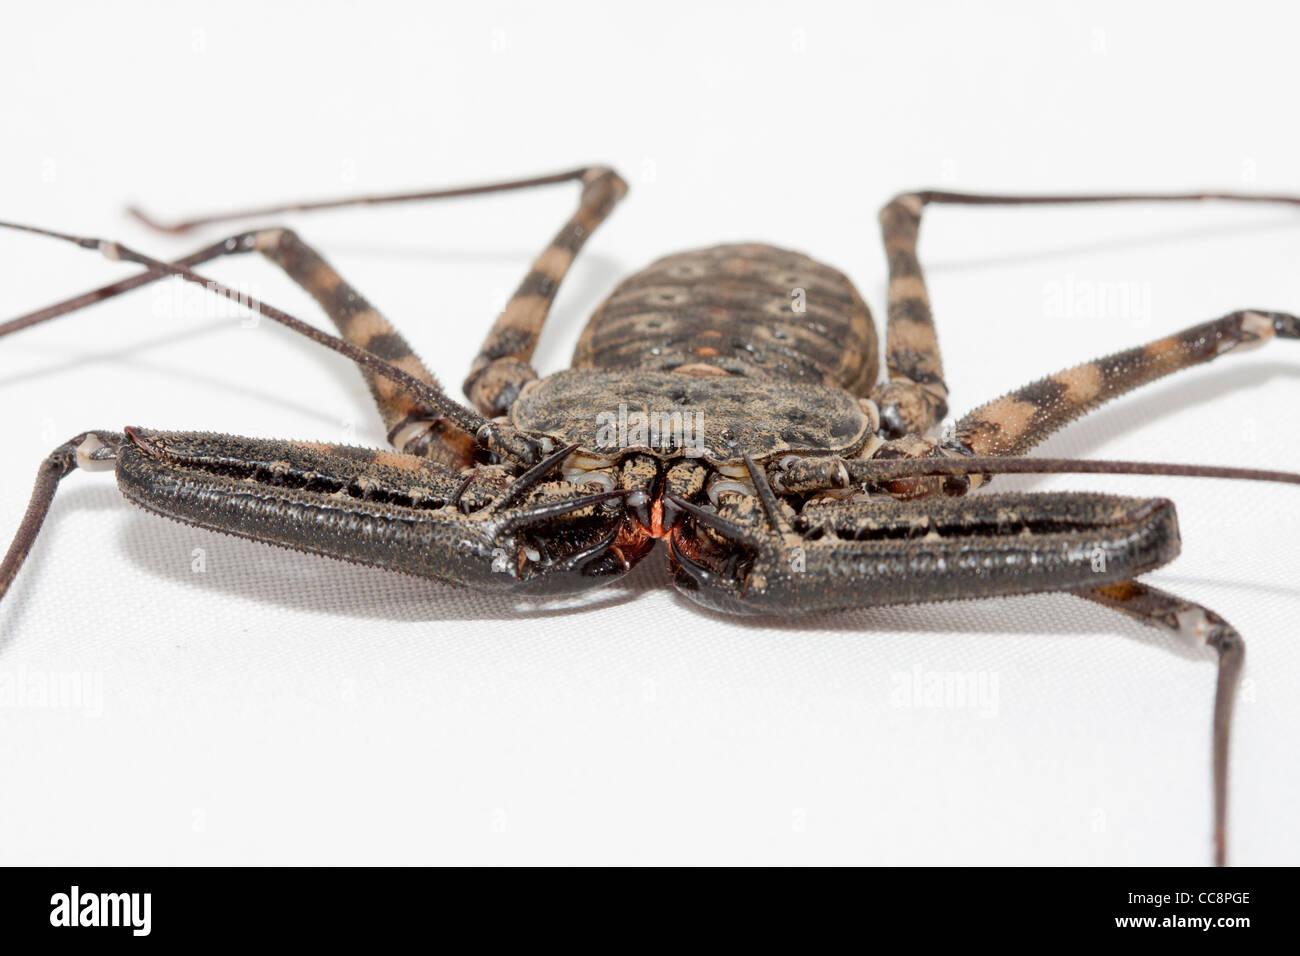 Giant Tanzanian Tail less Whip Scorpion - Stock Image